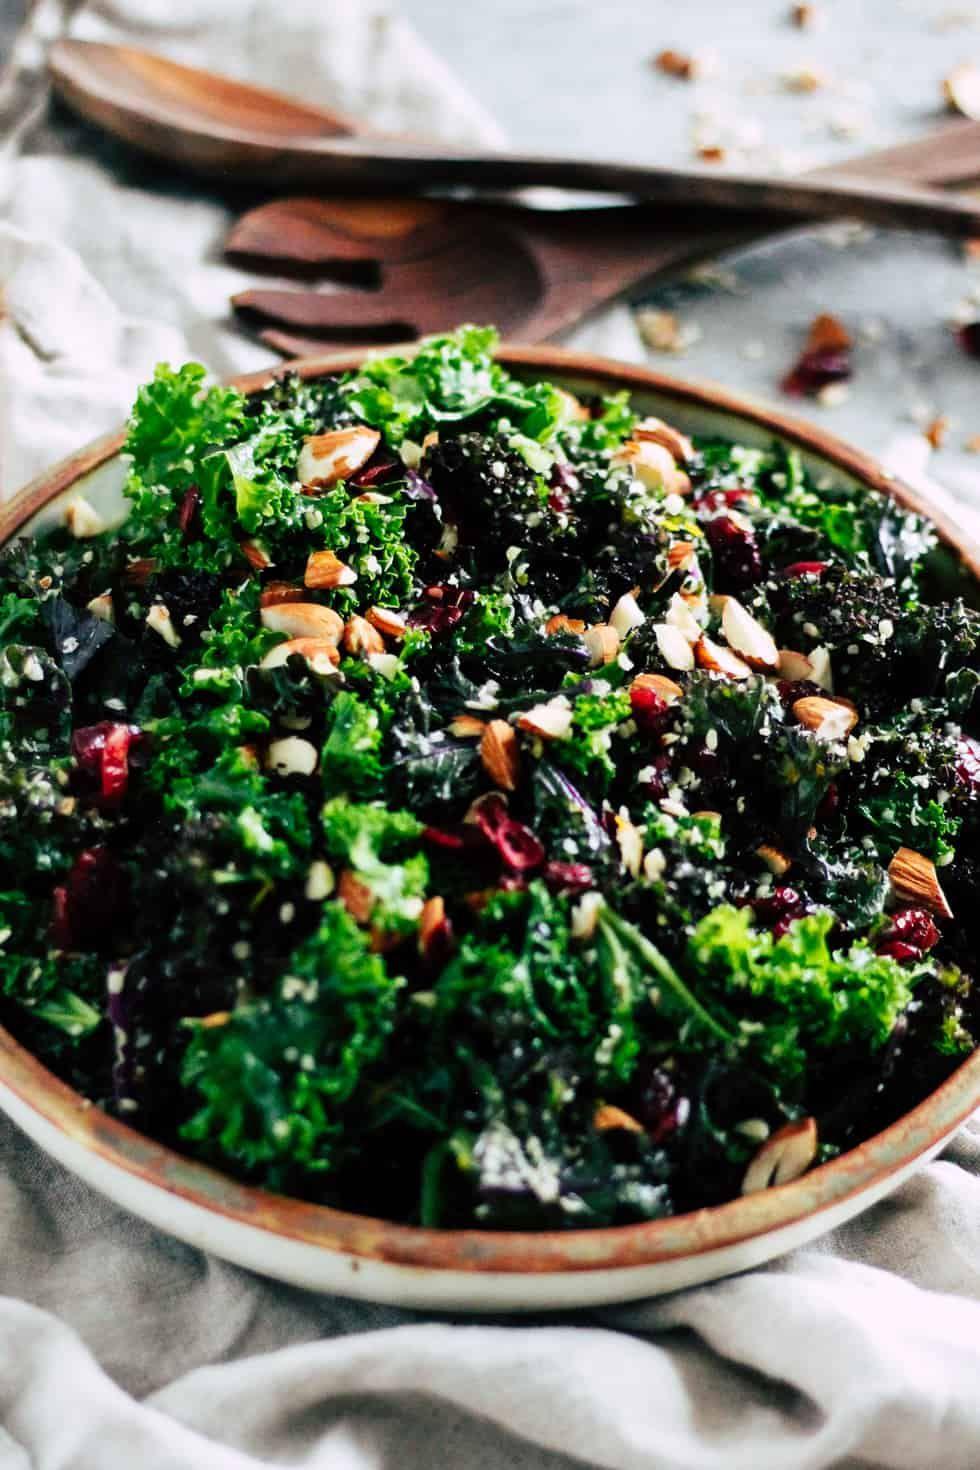 Make-Ahead Kale Salad + Cranberry Orange Dressing